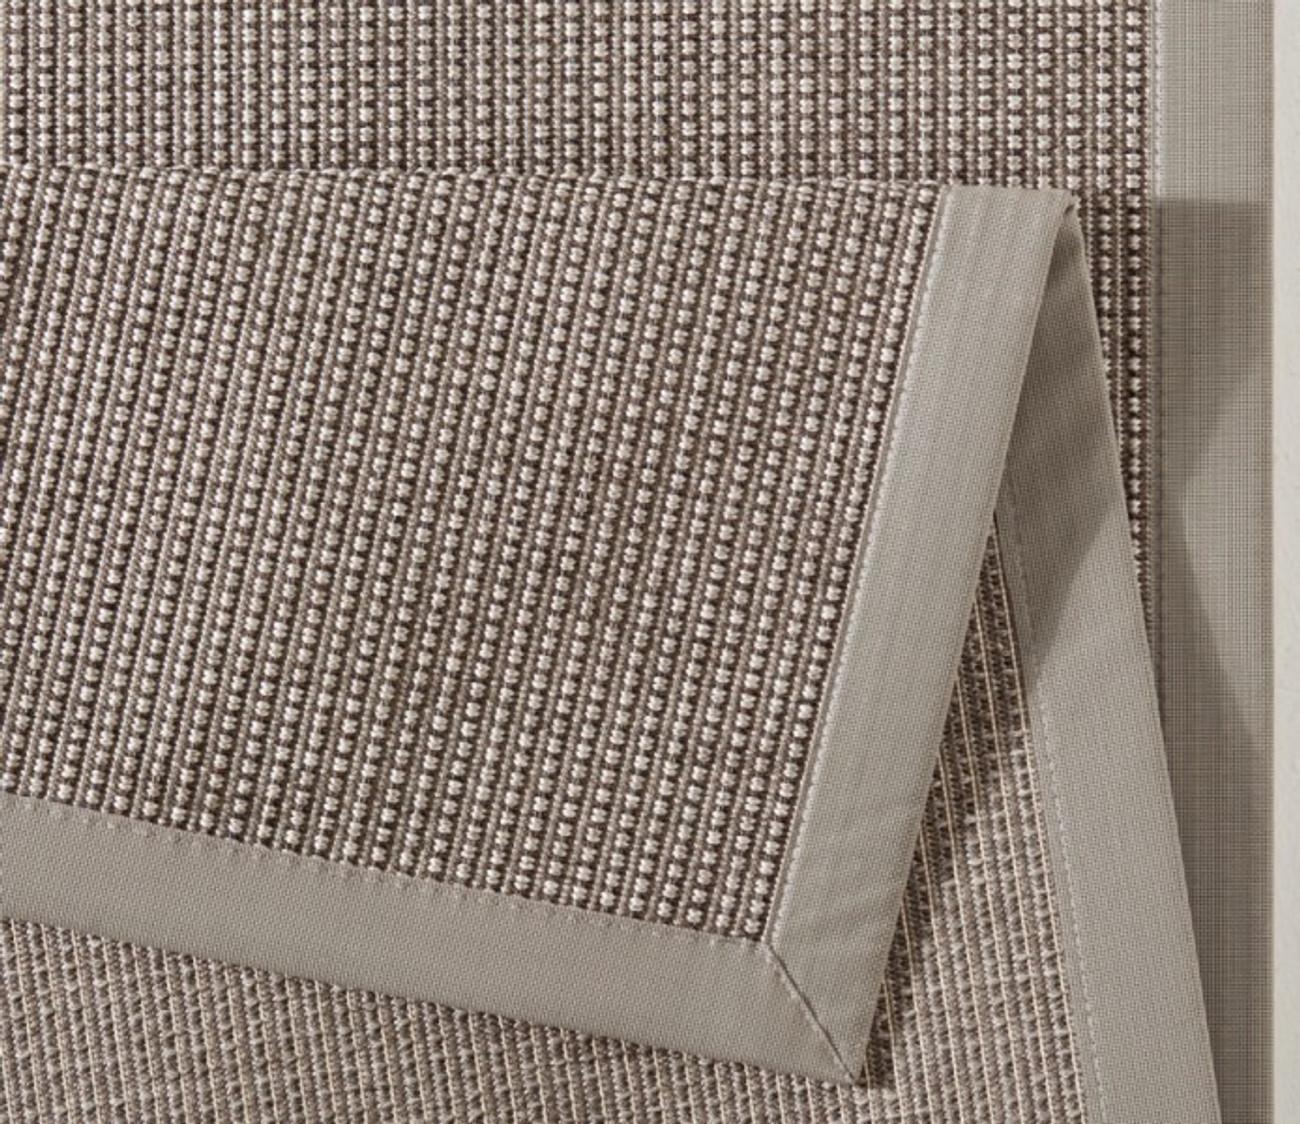 Design Flachgewebe Teppich Infinite Lines Taupe Grau 102261